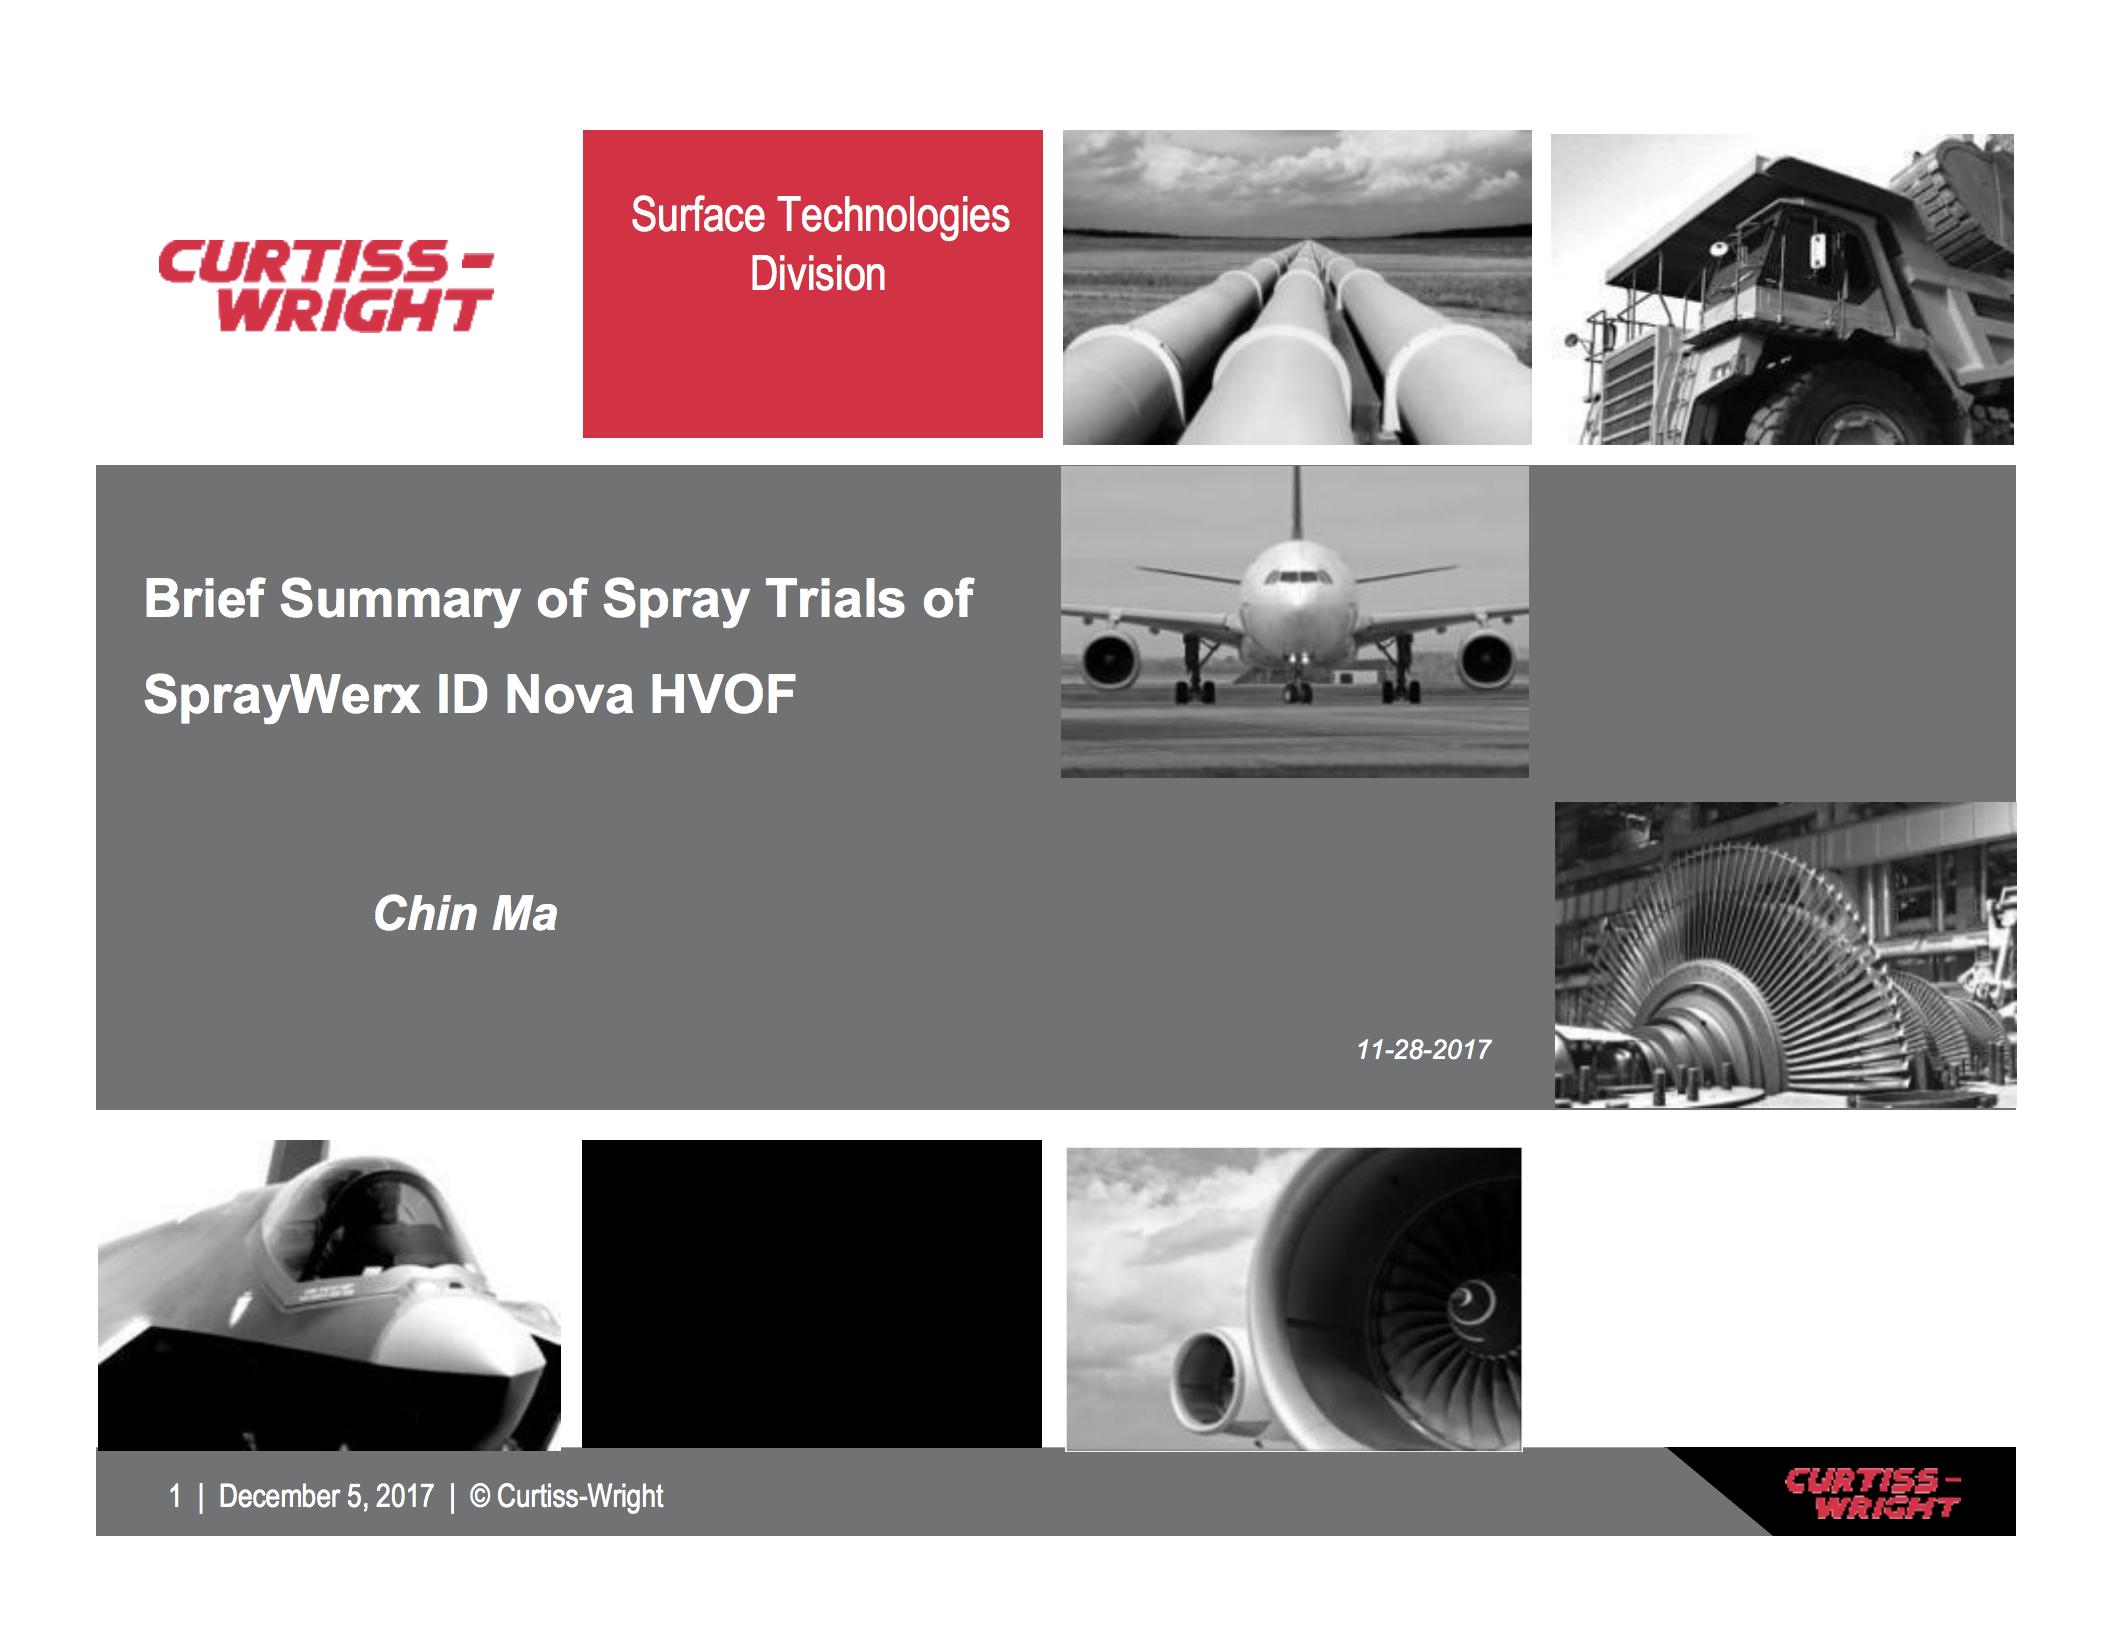 Curtiss Wright-Spraywerx